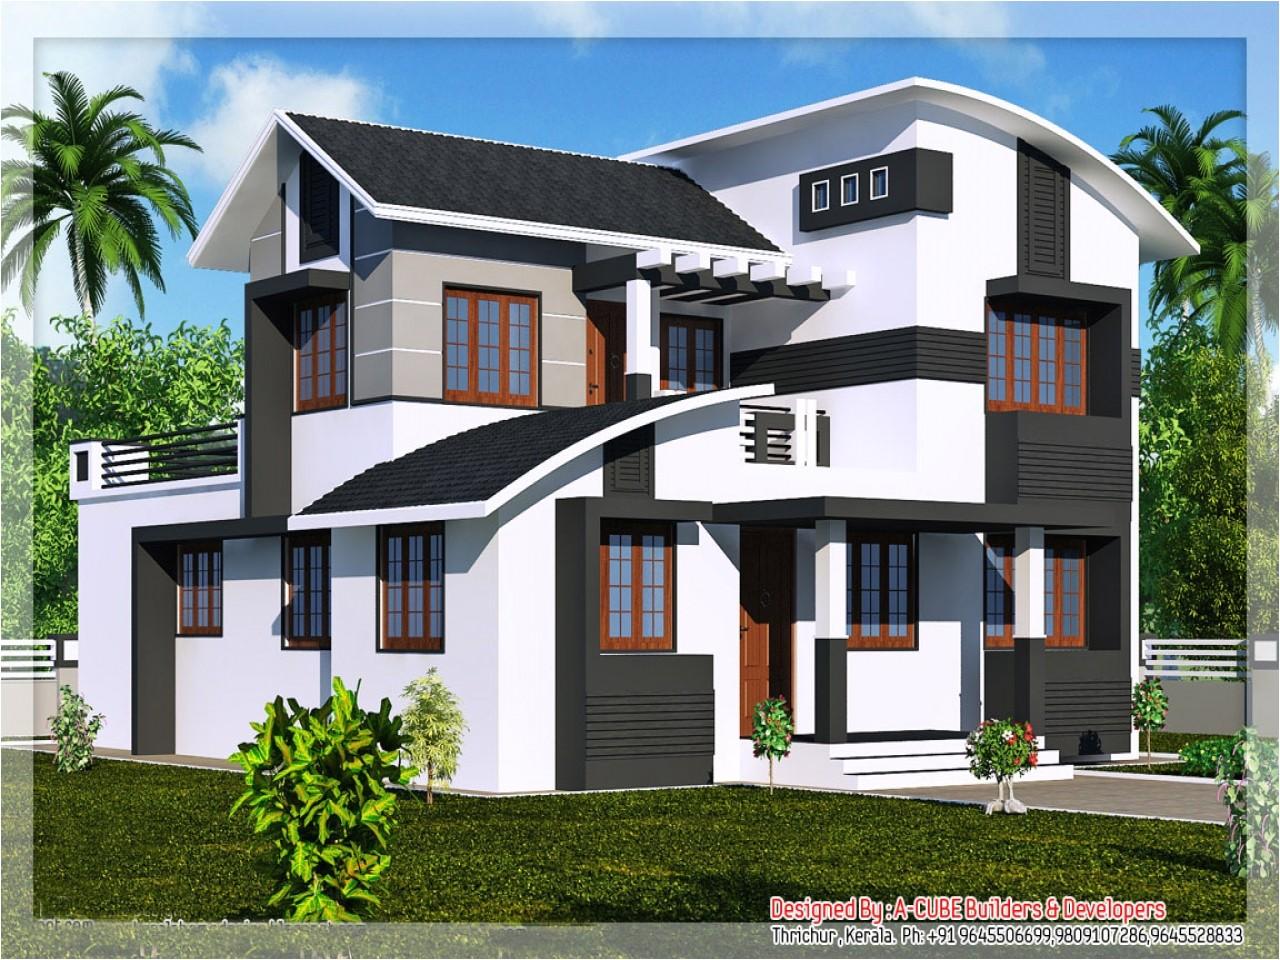 37aca81f092caf83 India Duplex House Design Duplex House Plans And Designs  In Usa